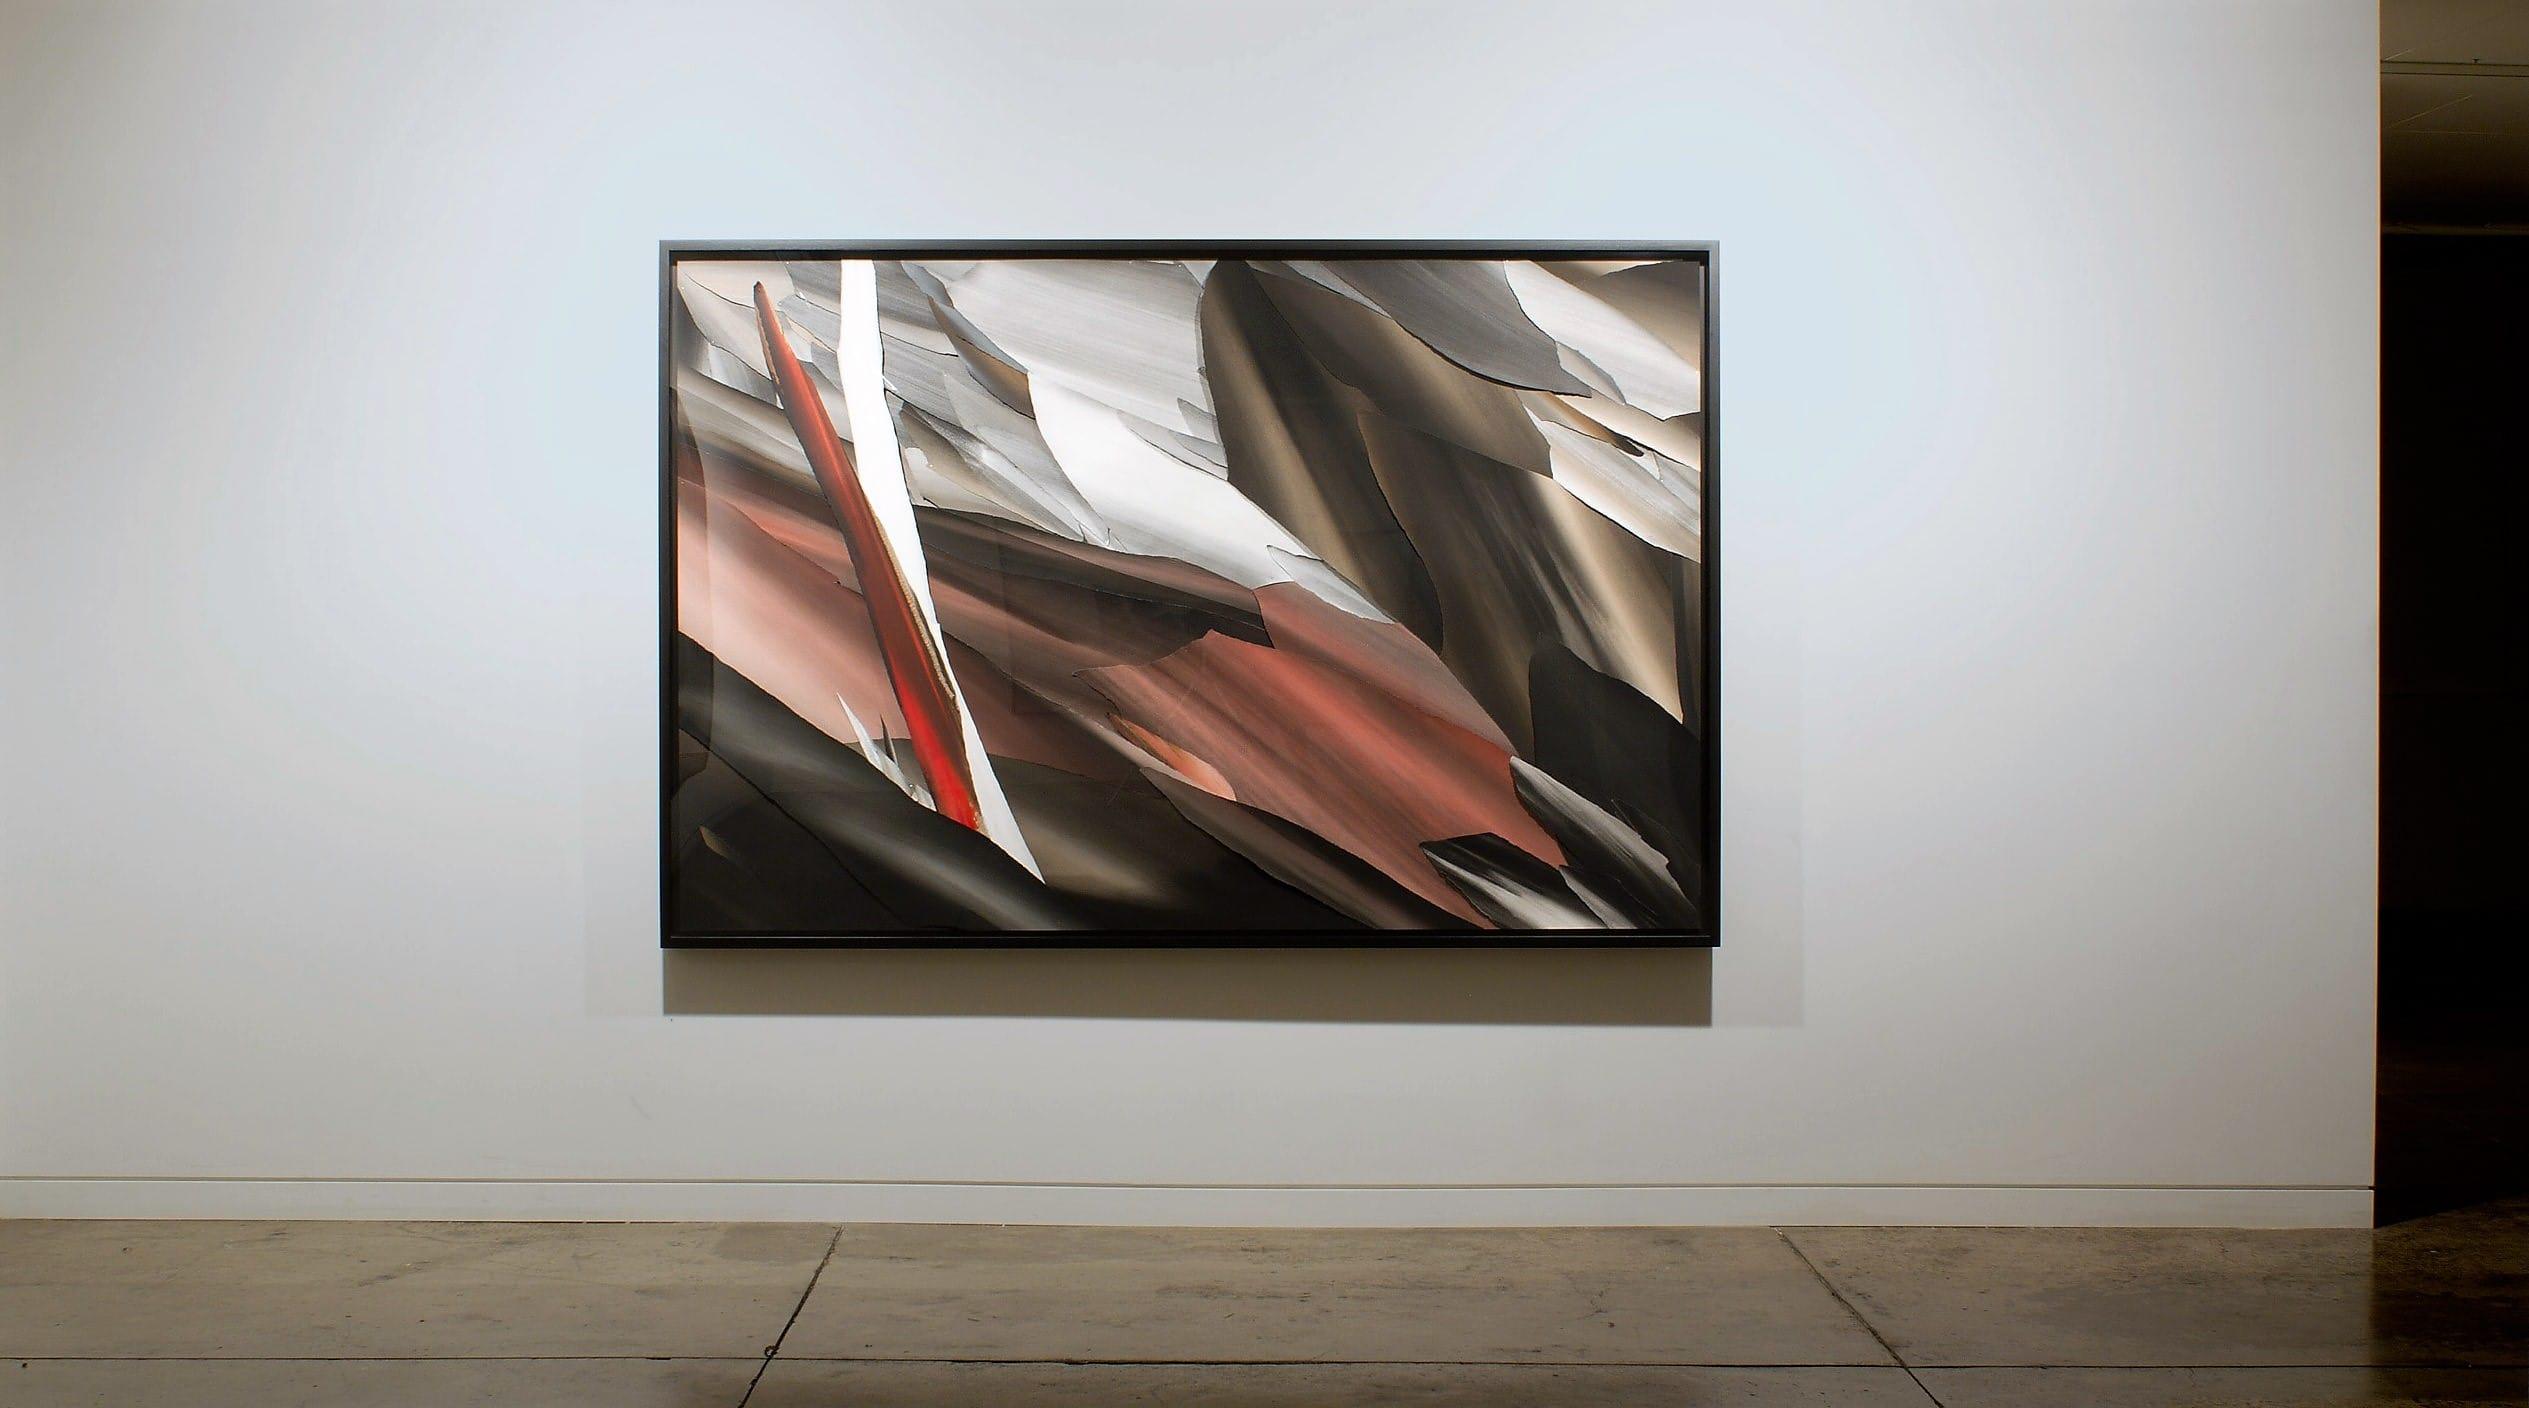 Kirstin Berg, Monument exhibition install